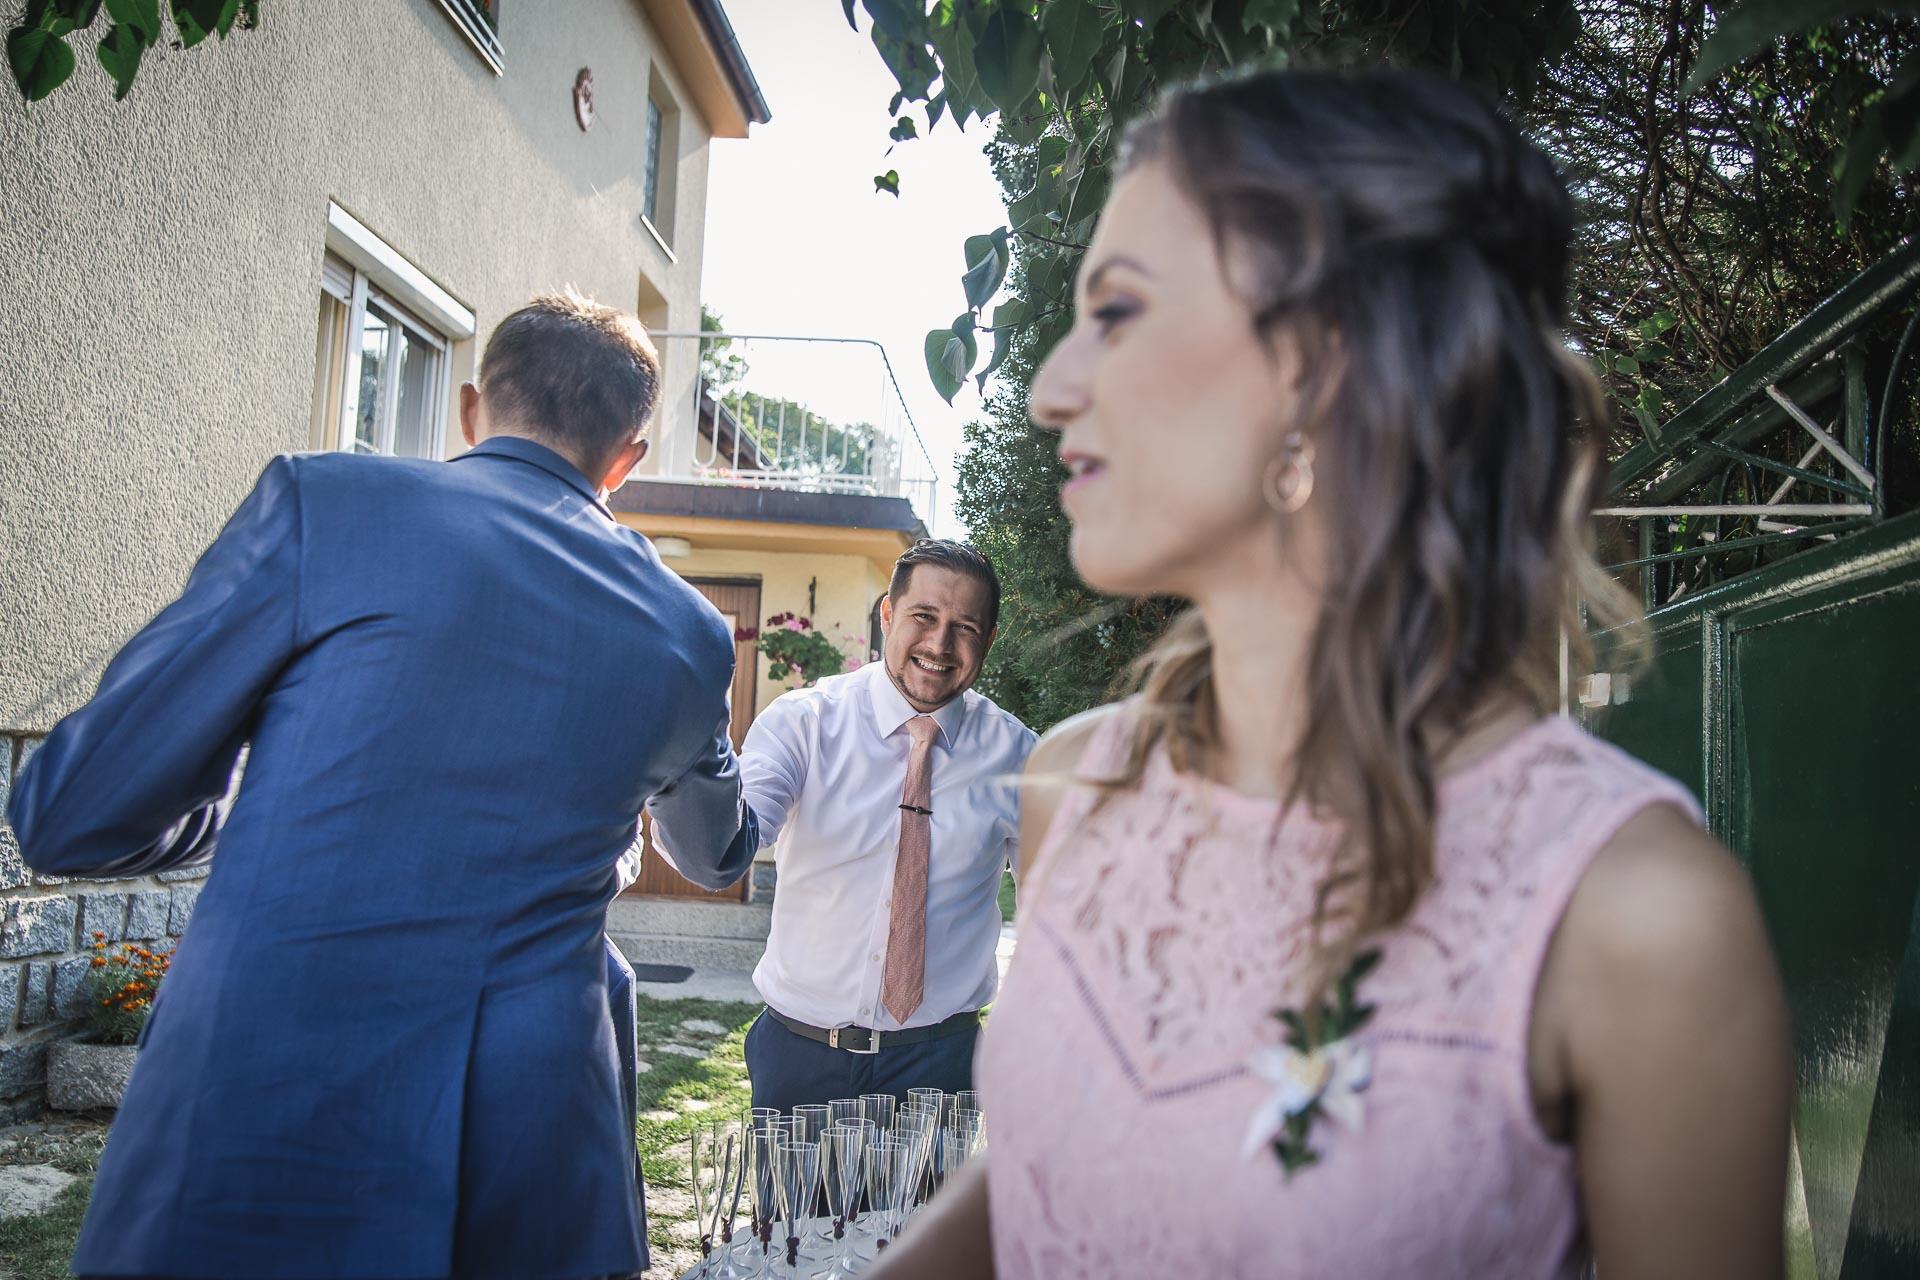 svatební-fotograf-wedding-svatebni-video-orlík-vltava-kostel-statek-stodola-boho-svatba-Beautyfoto-68